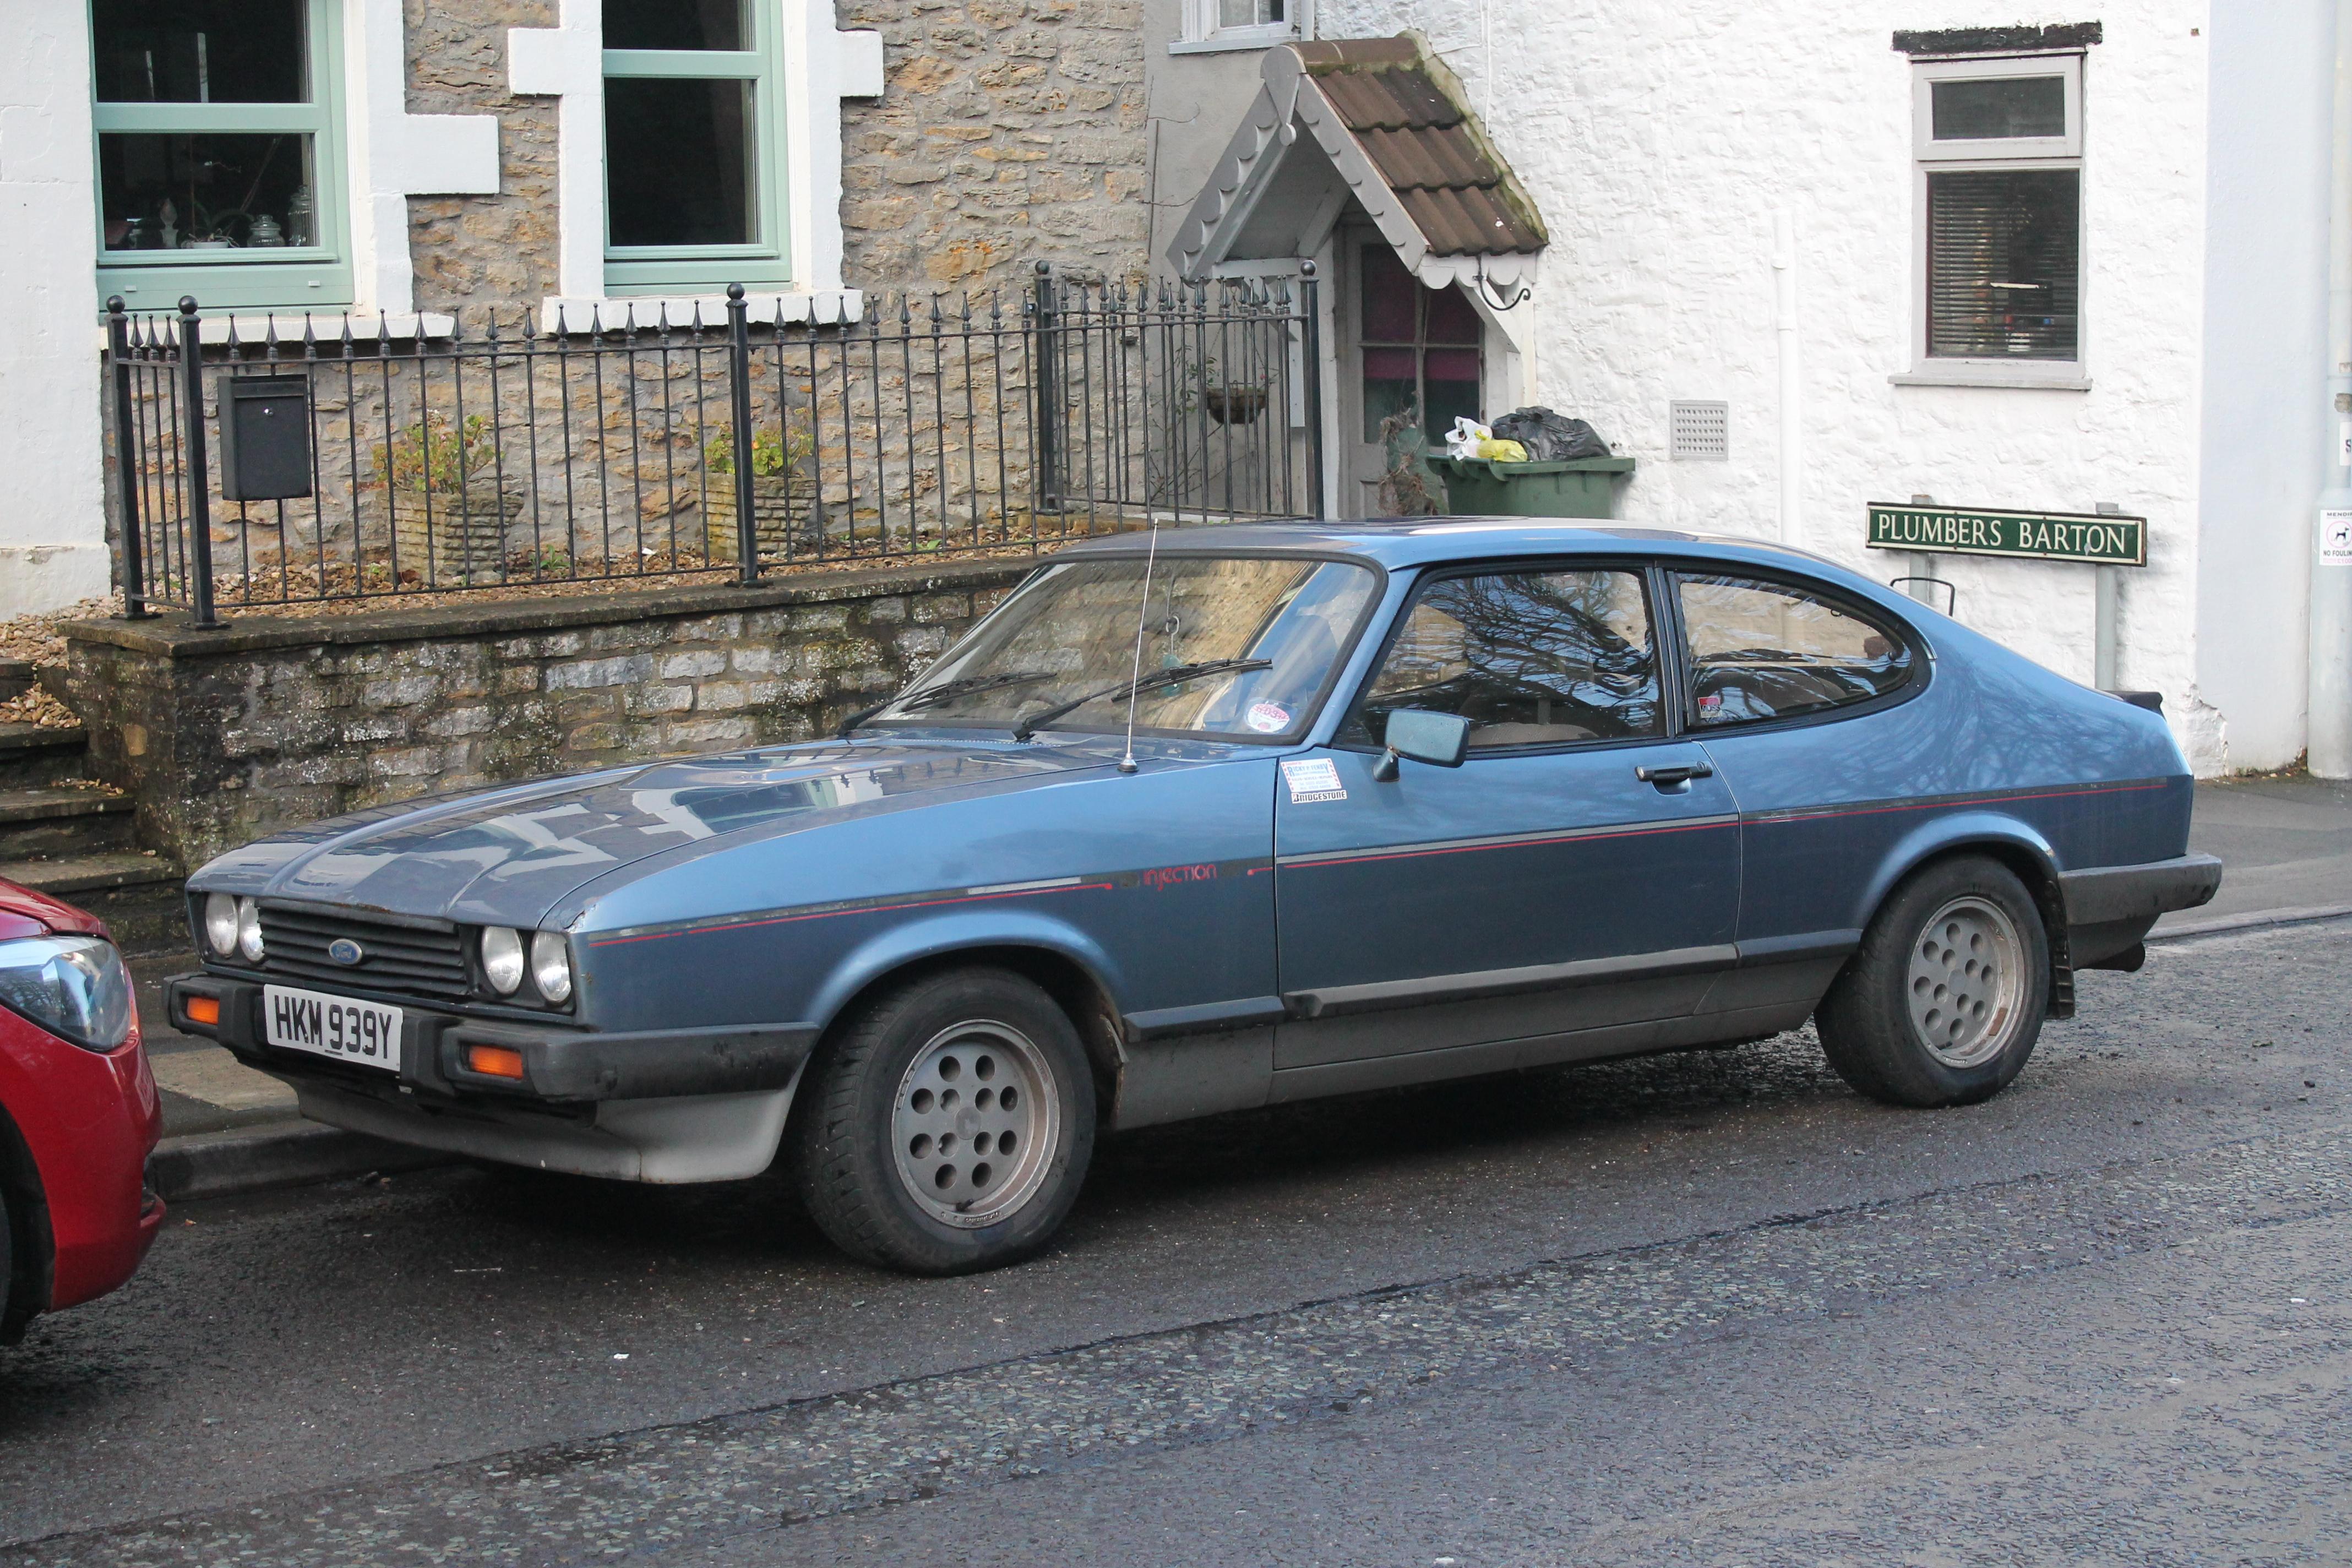 1983 ford capri 2 8 injection (12776736393) jpg